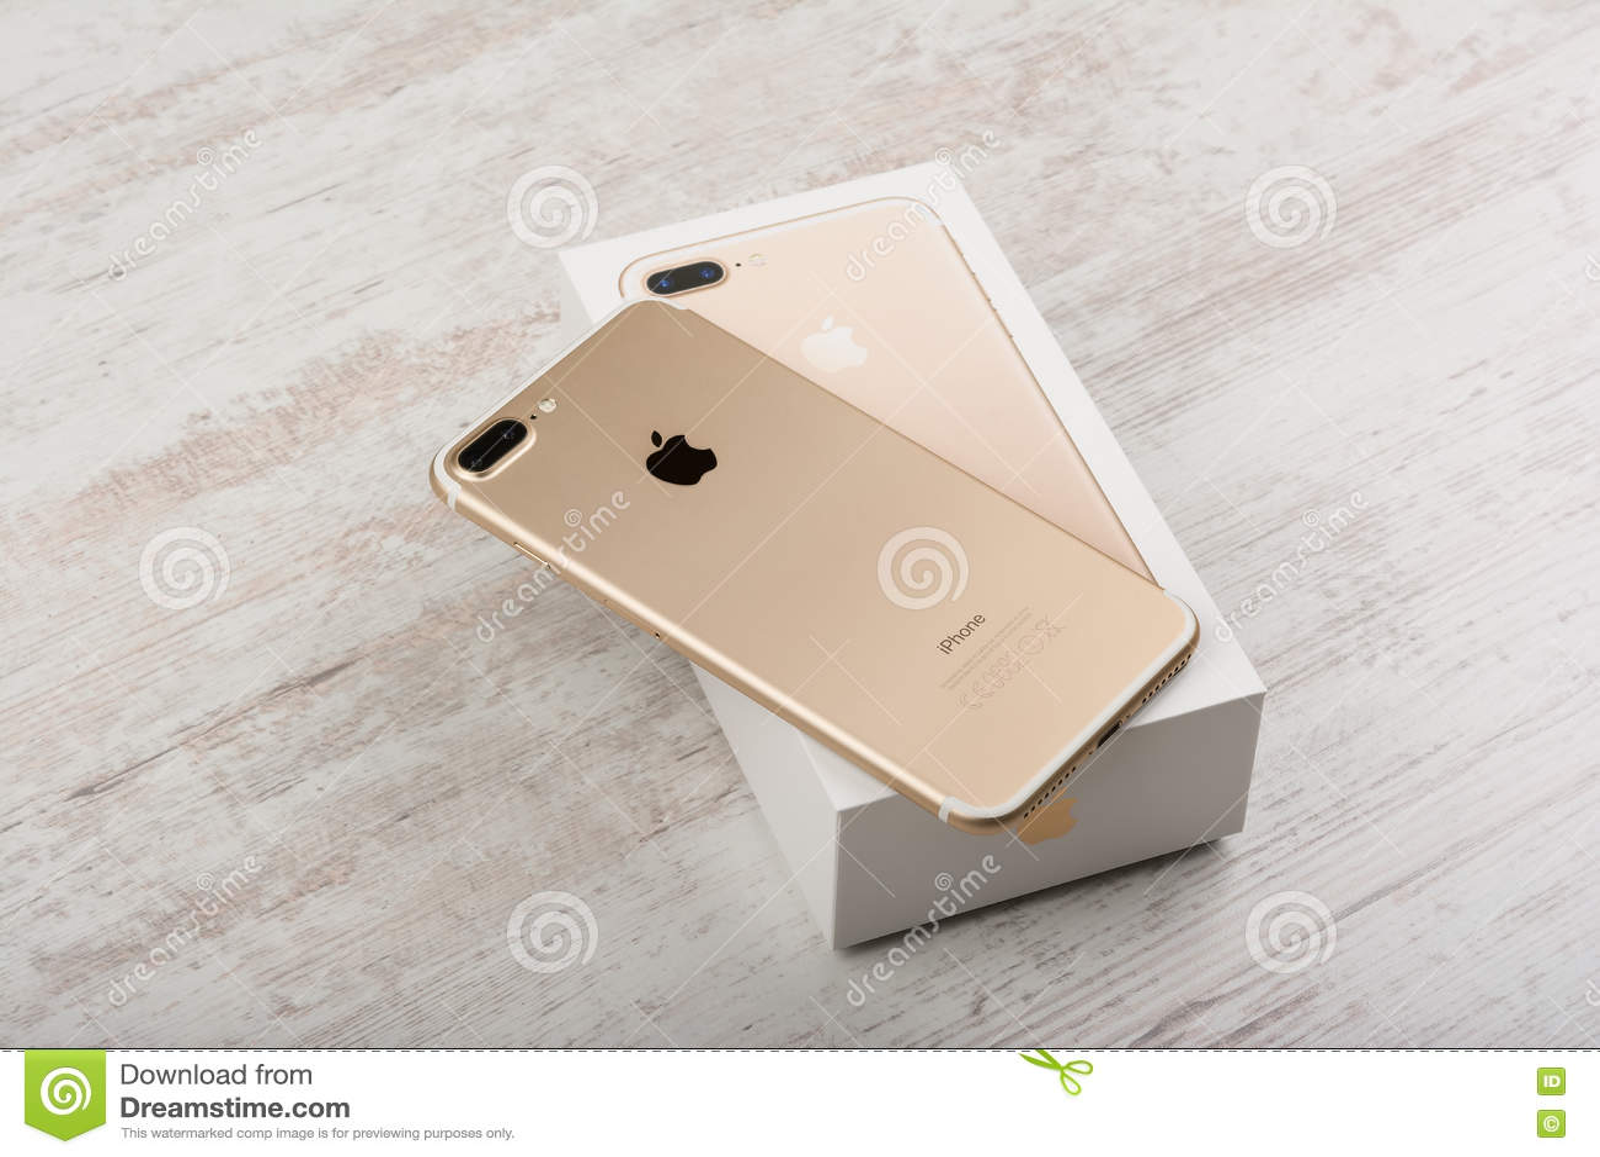 Burgas Bulgaria October 22 2016 New Apple Iphone 7 Plus Gold On